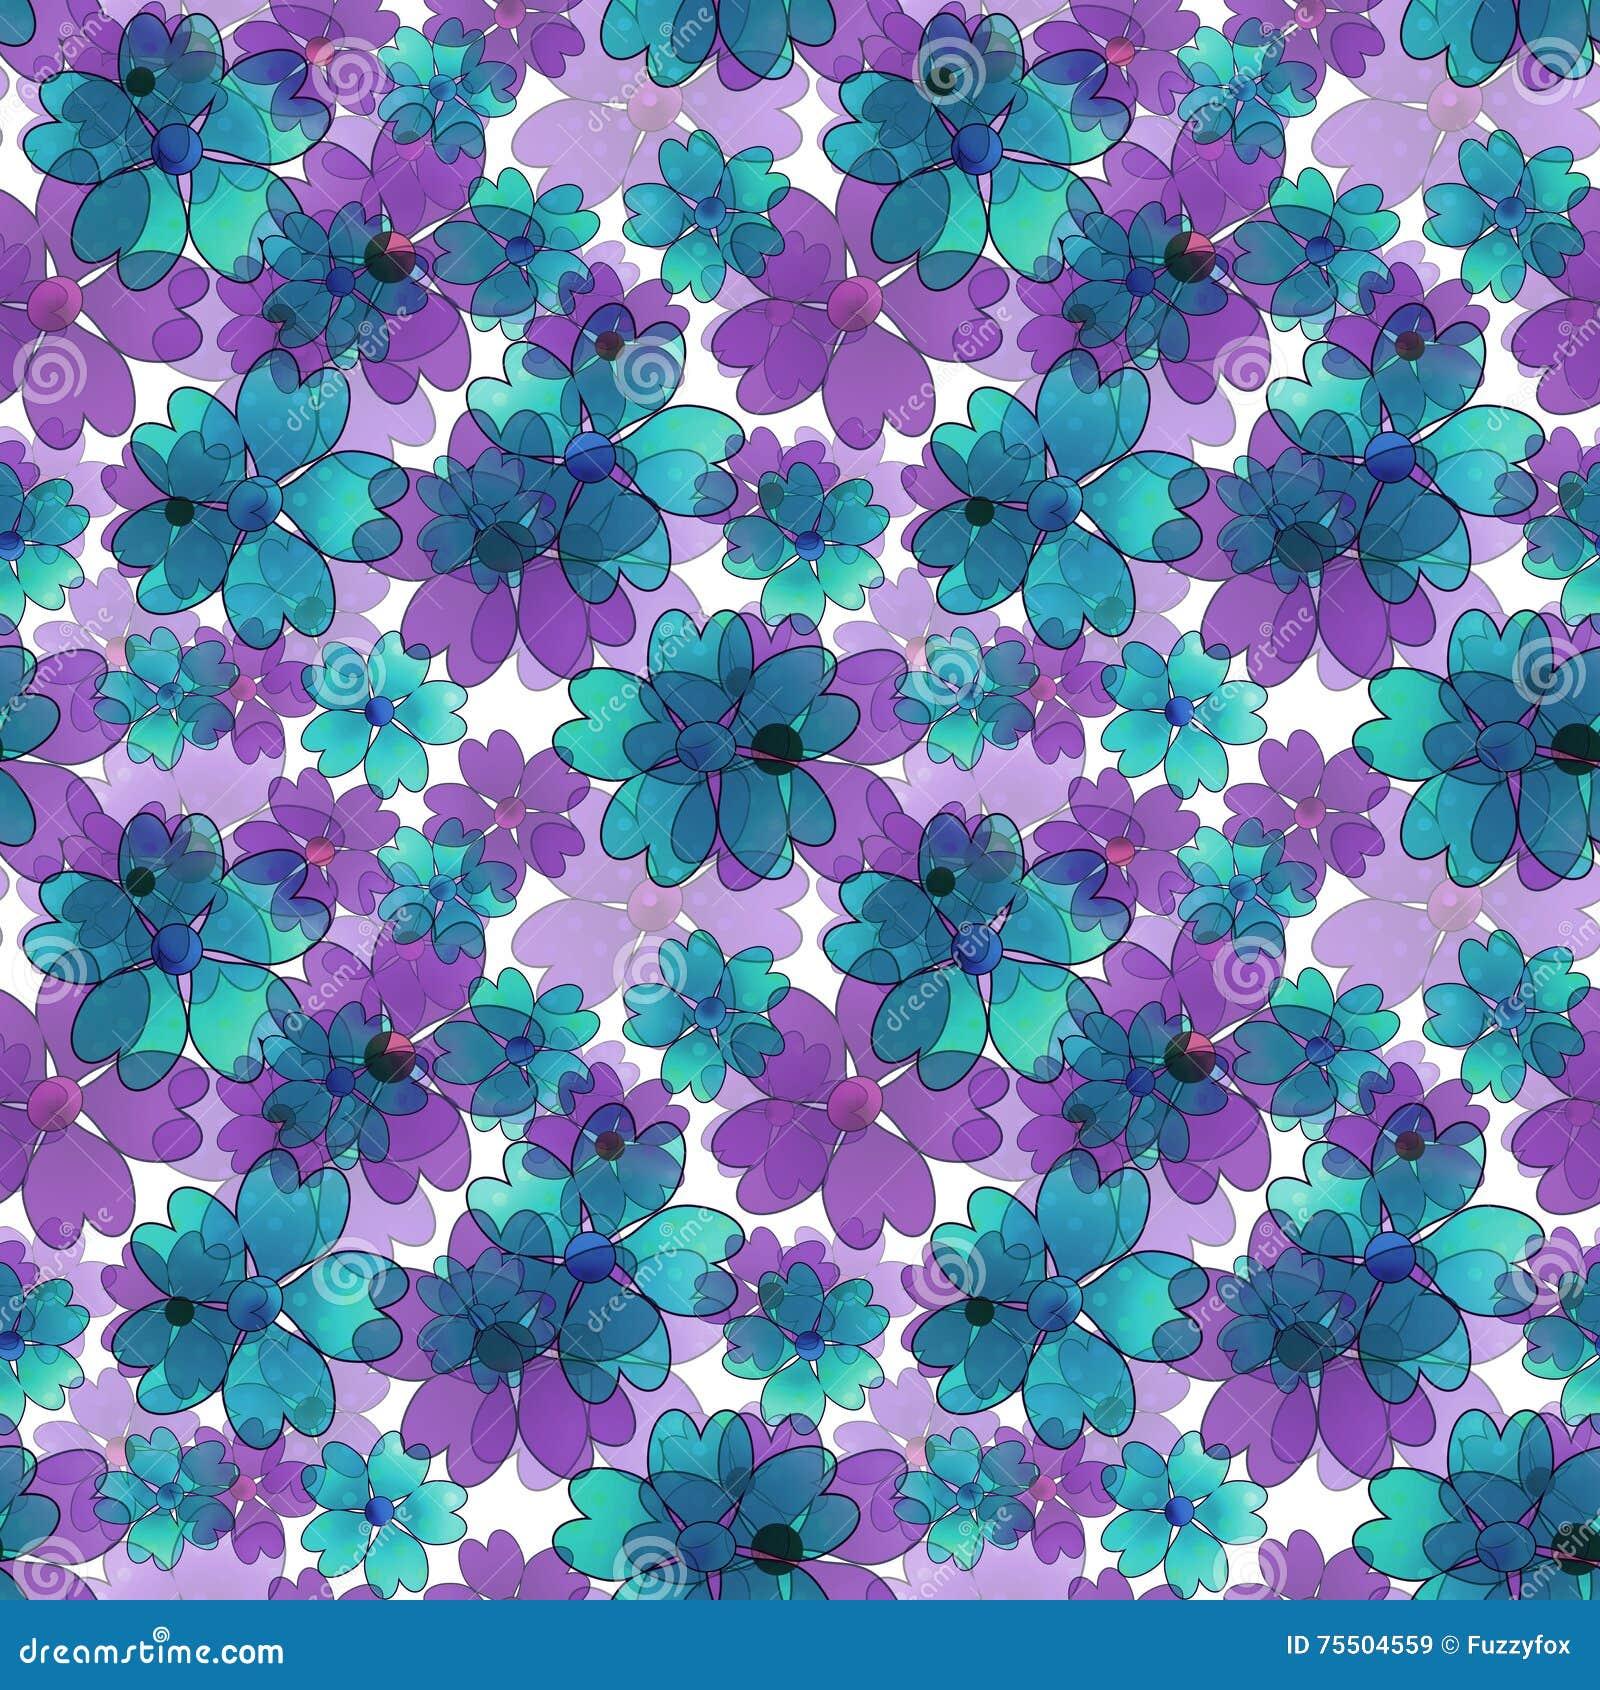 Seamless floral pattern wallpaper seamless flower pattern backg seamless floral pattern wallpaper seamless flower pattern backg mightylinksfo